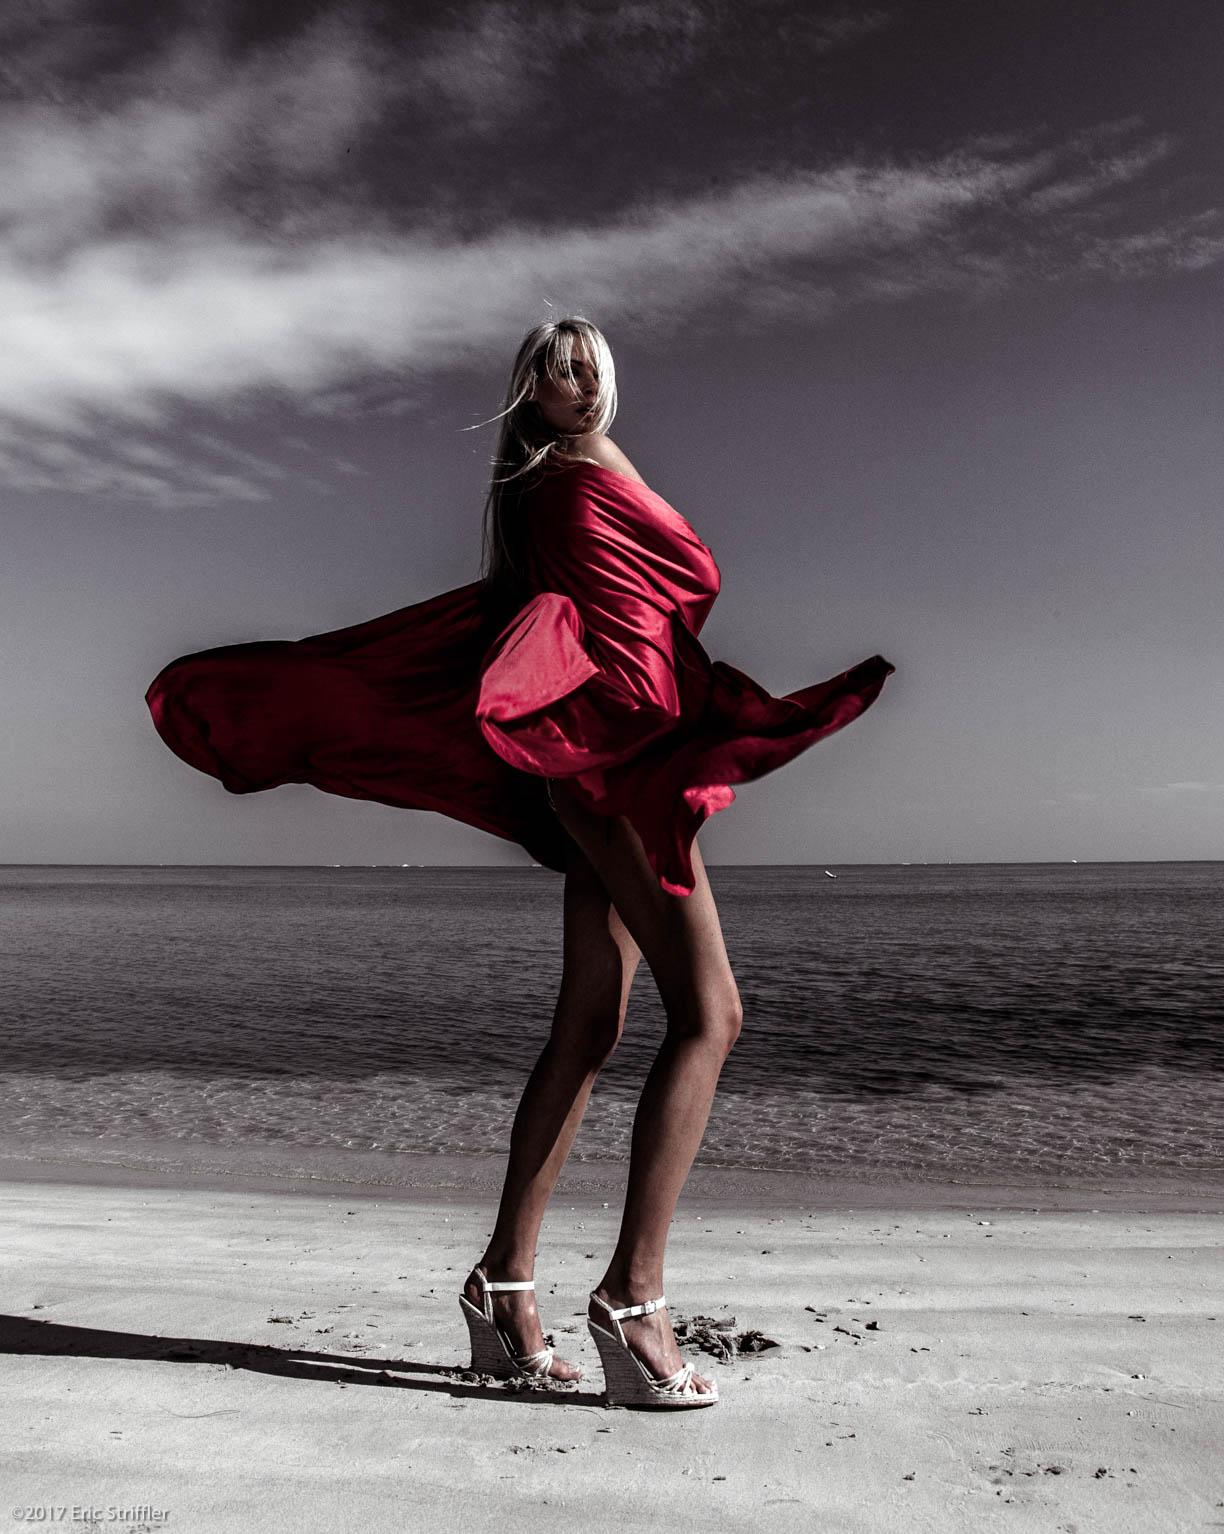 eric_striffler_photography_travel-137.jpg